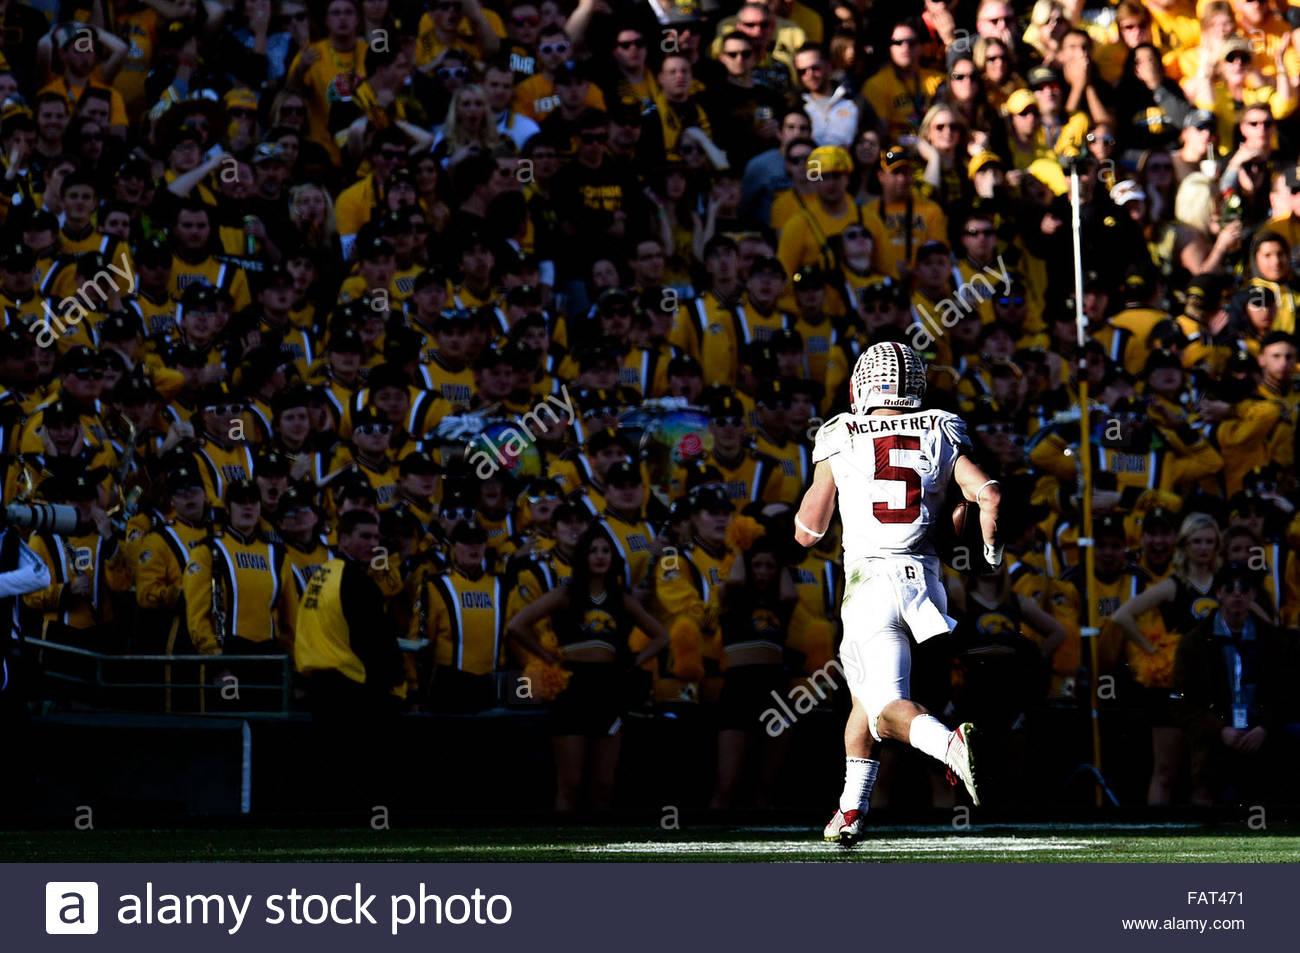 Pasadena, California, USA. 03rd Jan, 2016. Stanford running back Christian McCaffrey (5) runs for a touchdown against - Stock Image